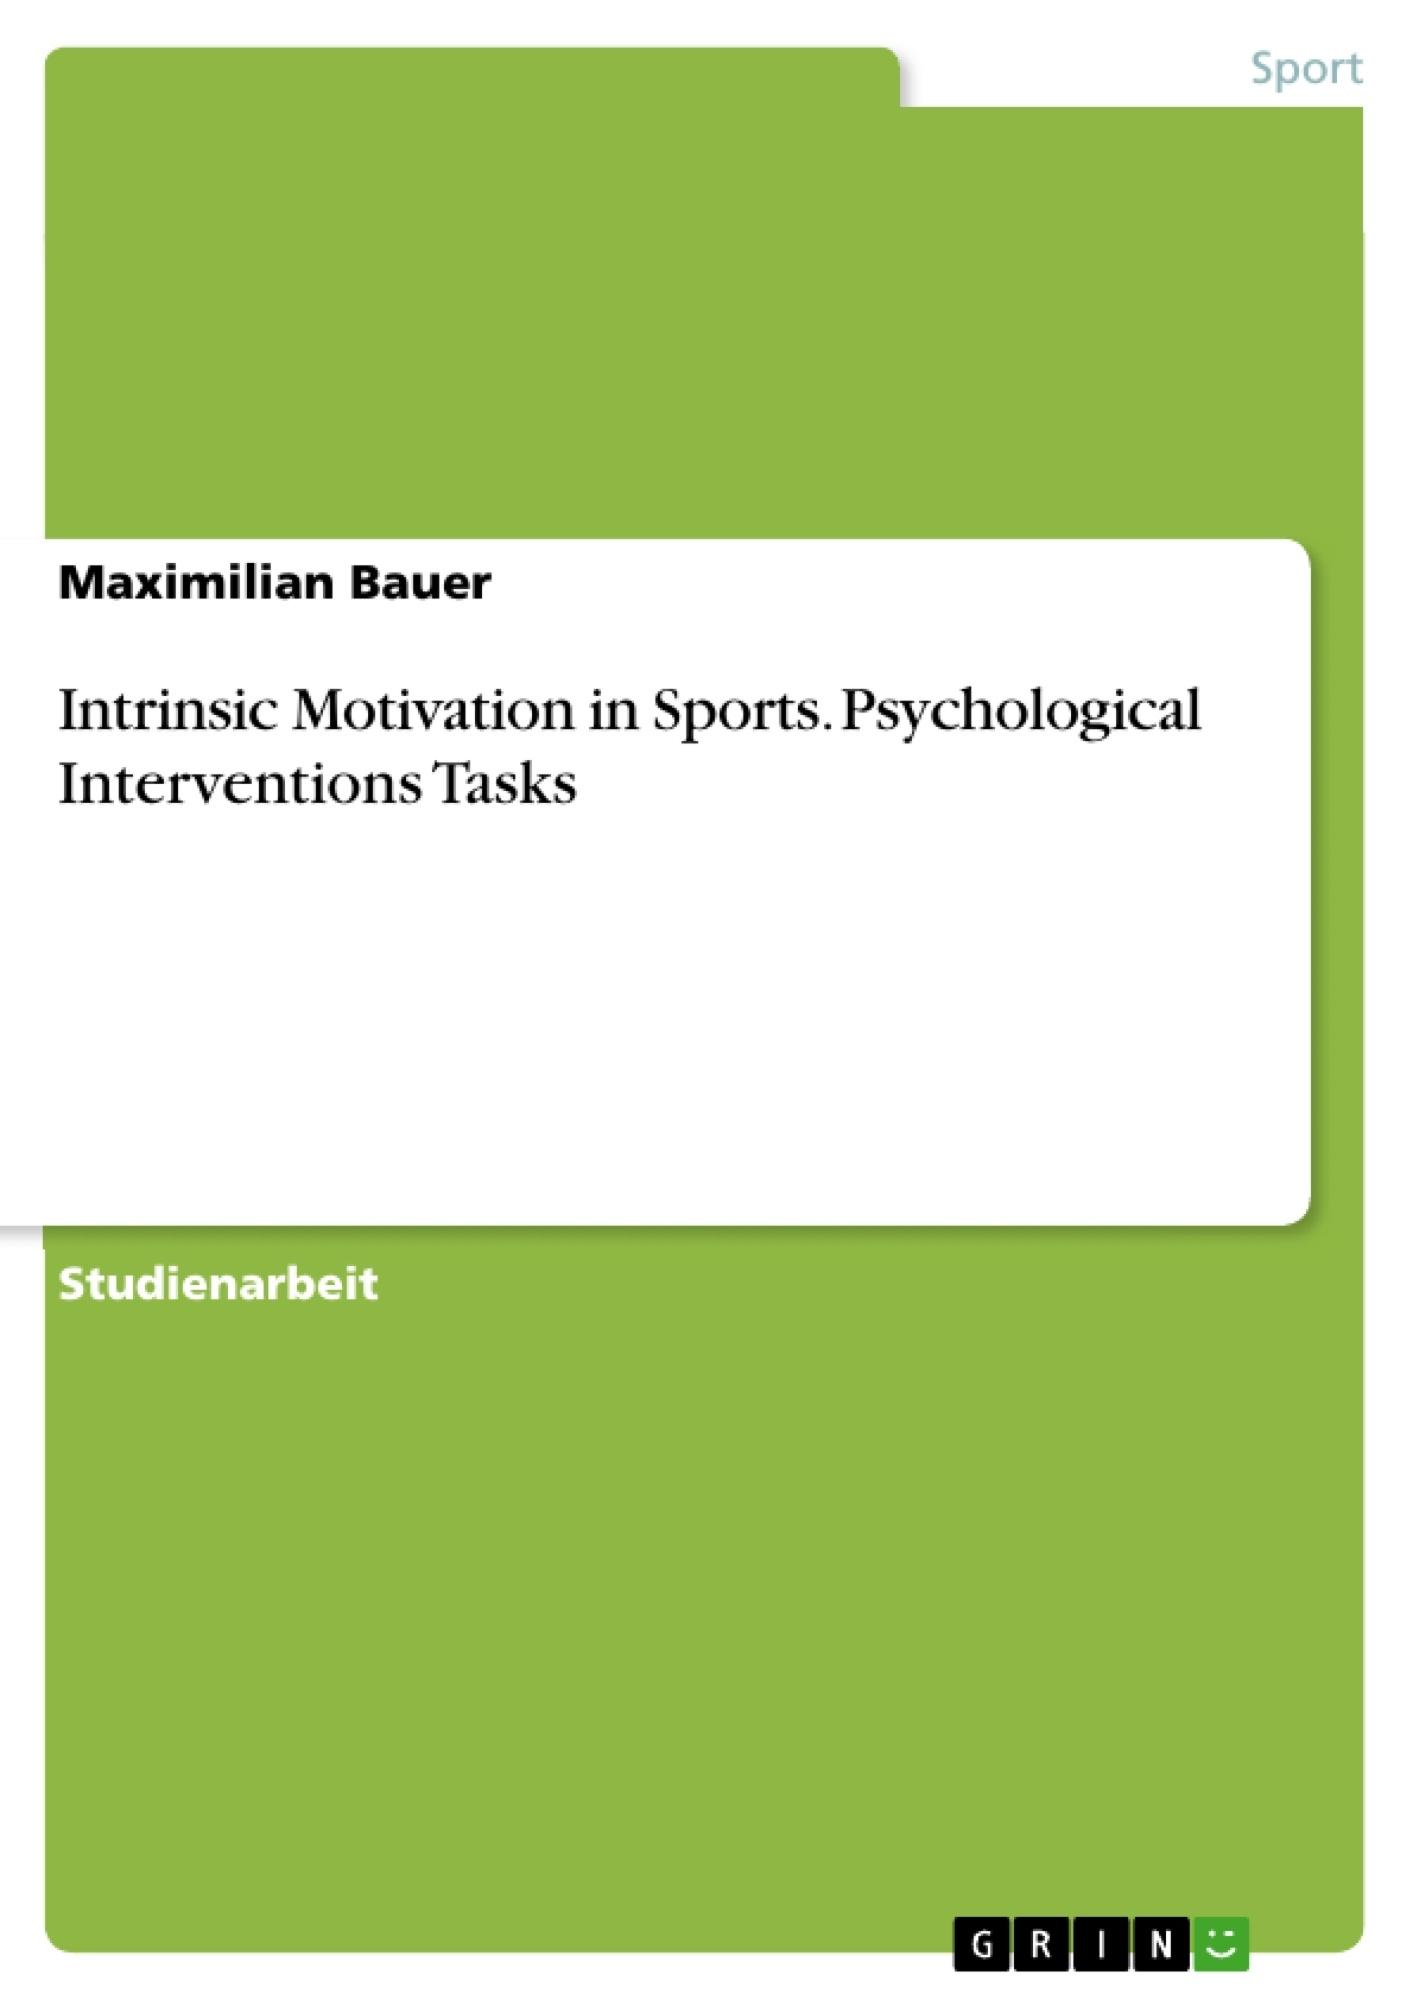 Titel: Intrinsic Motivation in Sports. Psychological Interventions Tasks